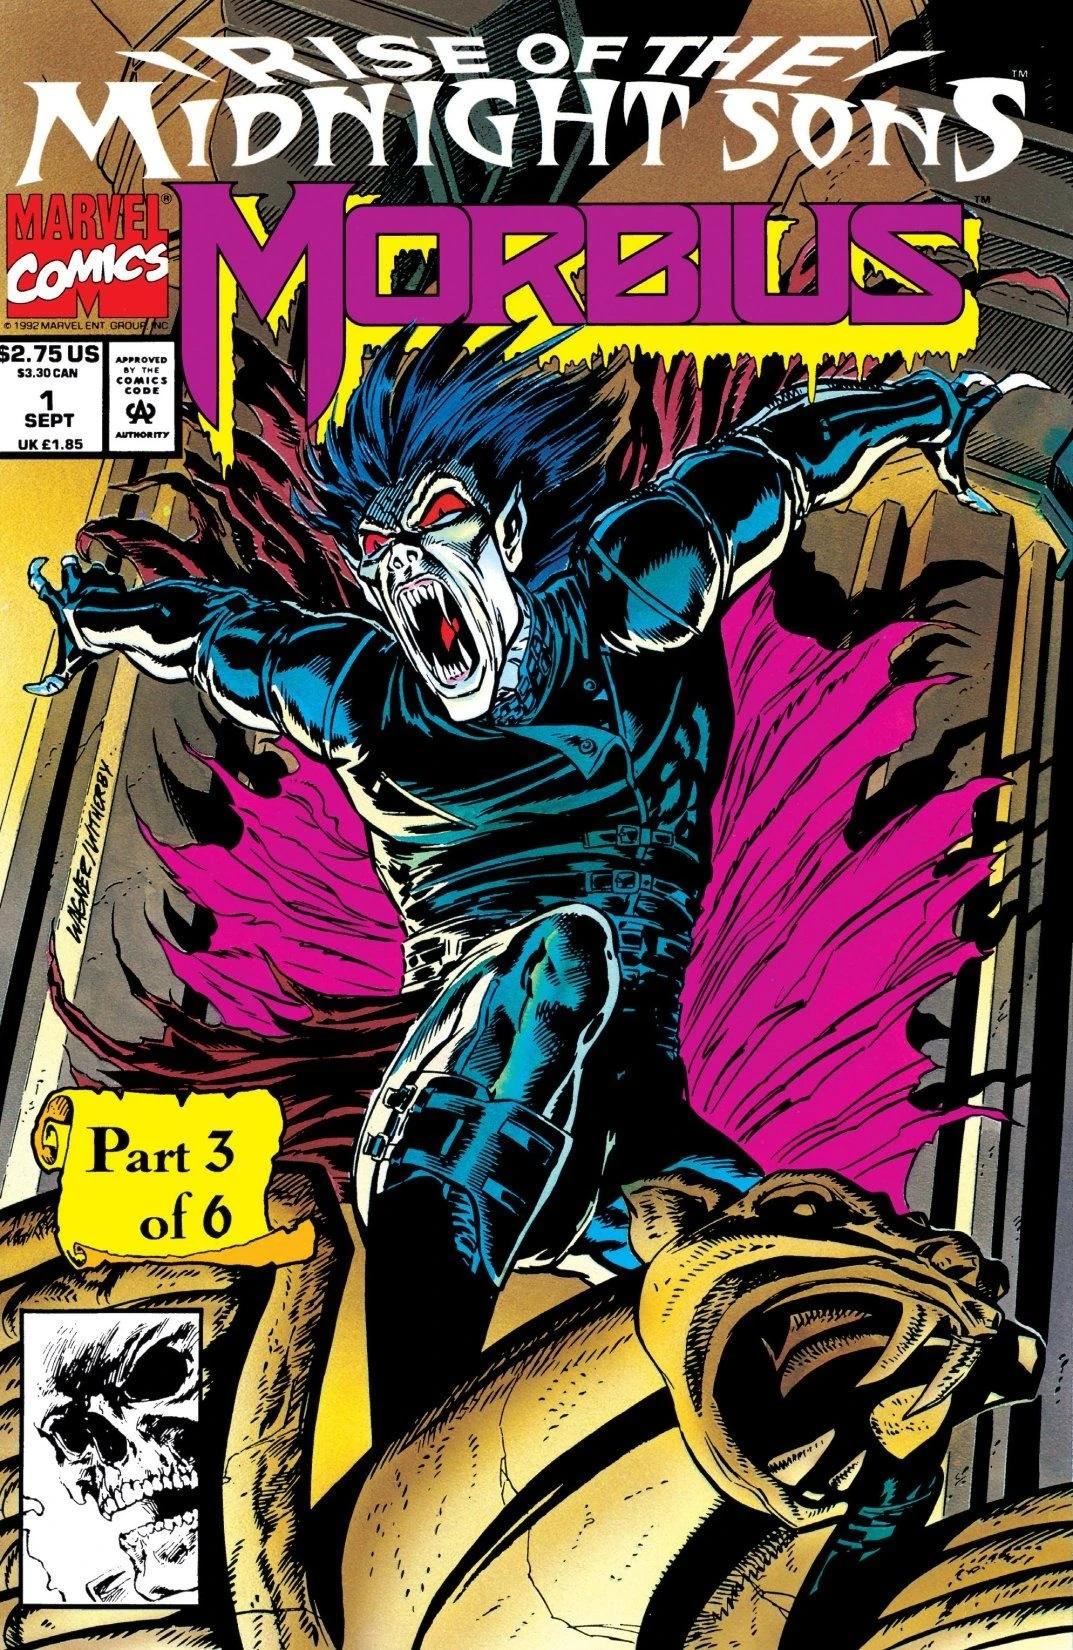 Morbius: The Living Vampire 1